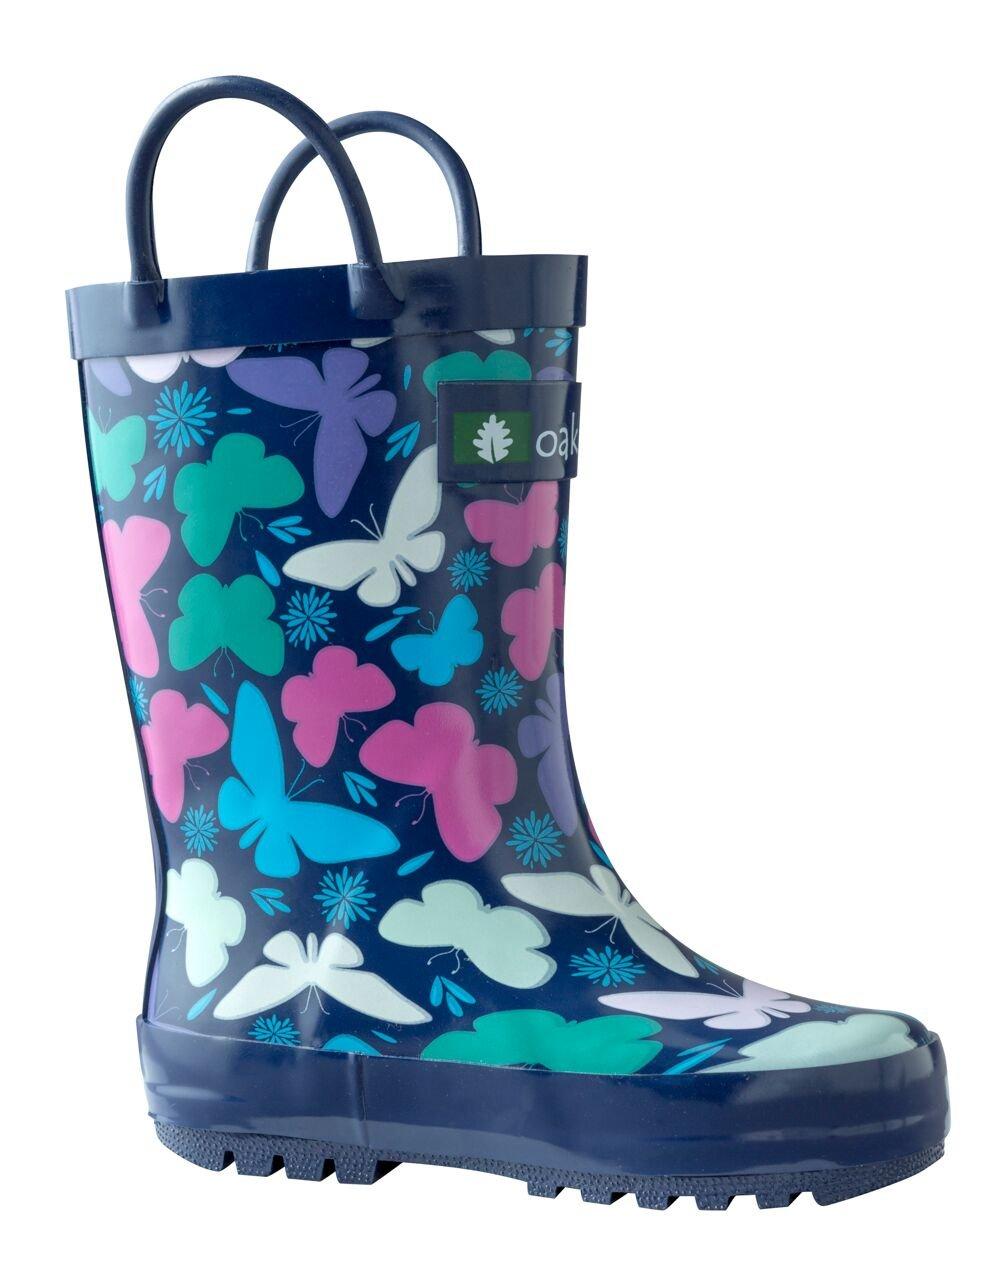 Oakiwear Kids Rubber Rain Boots with Easy-On Handles, Butterflies, 6T US Toddler